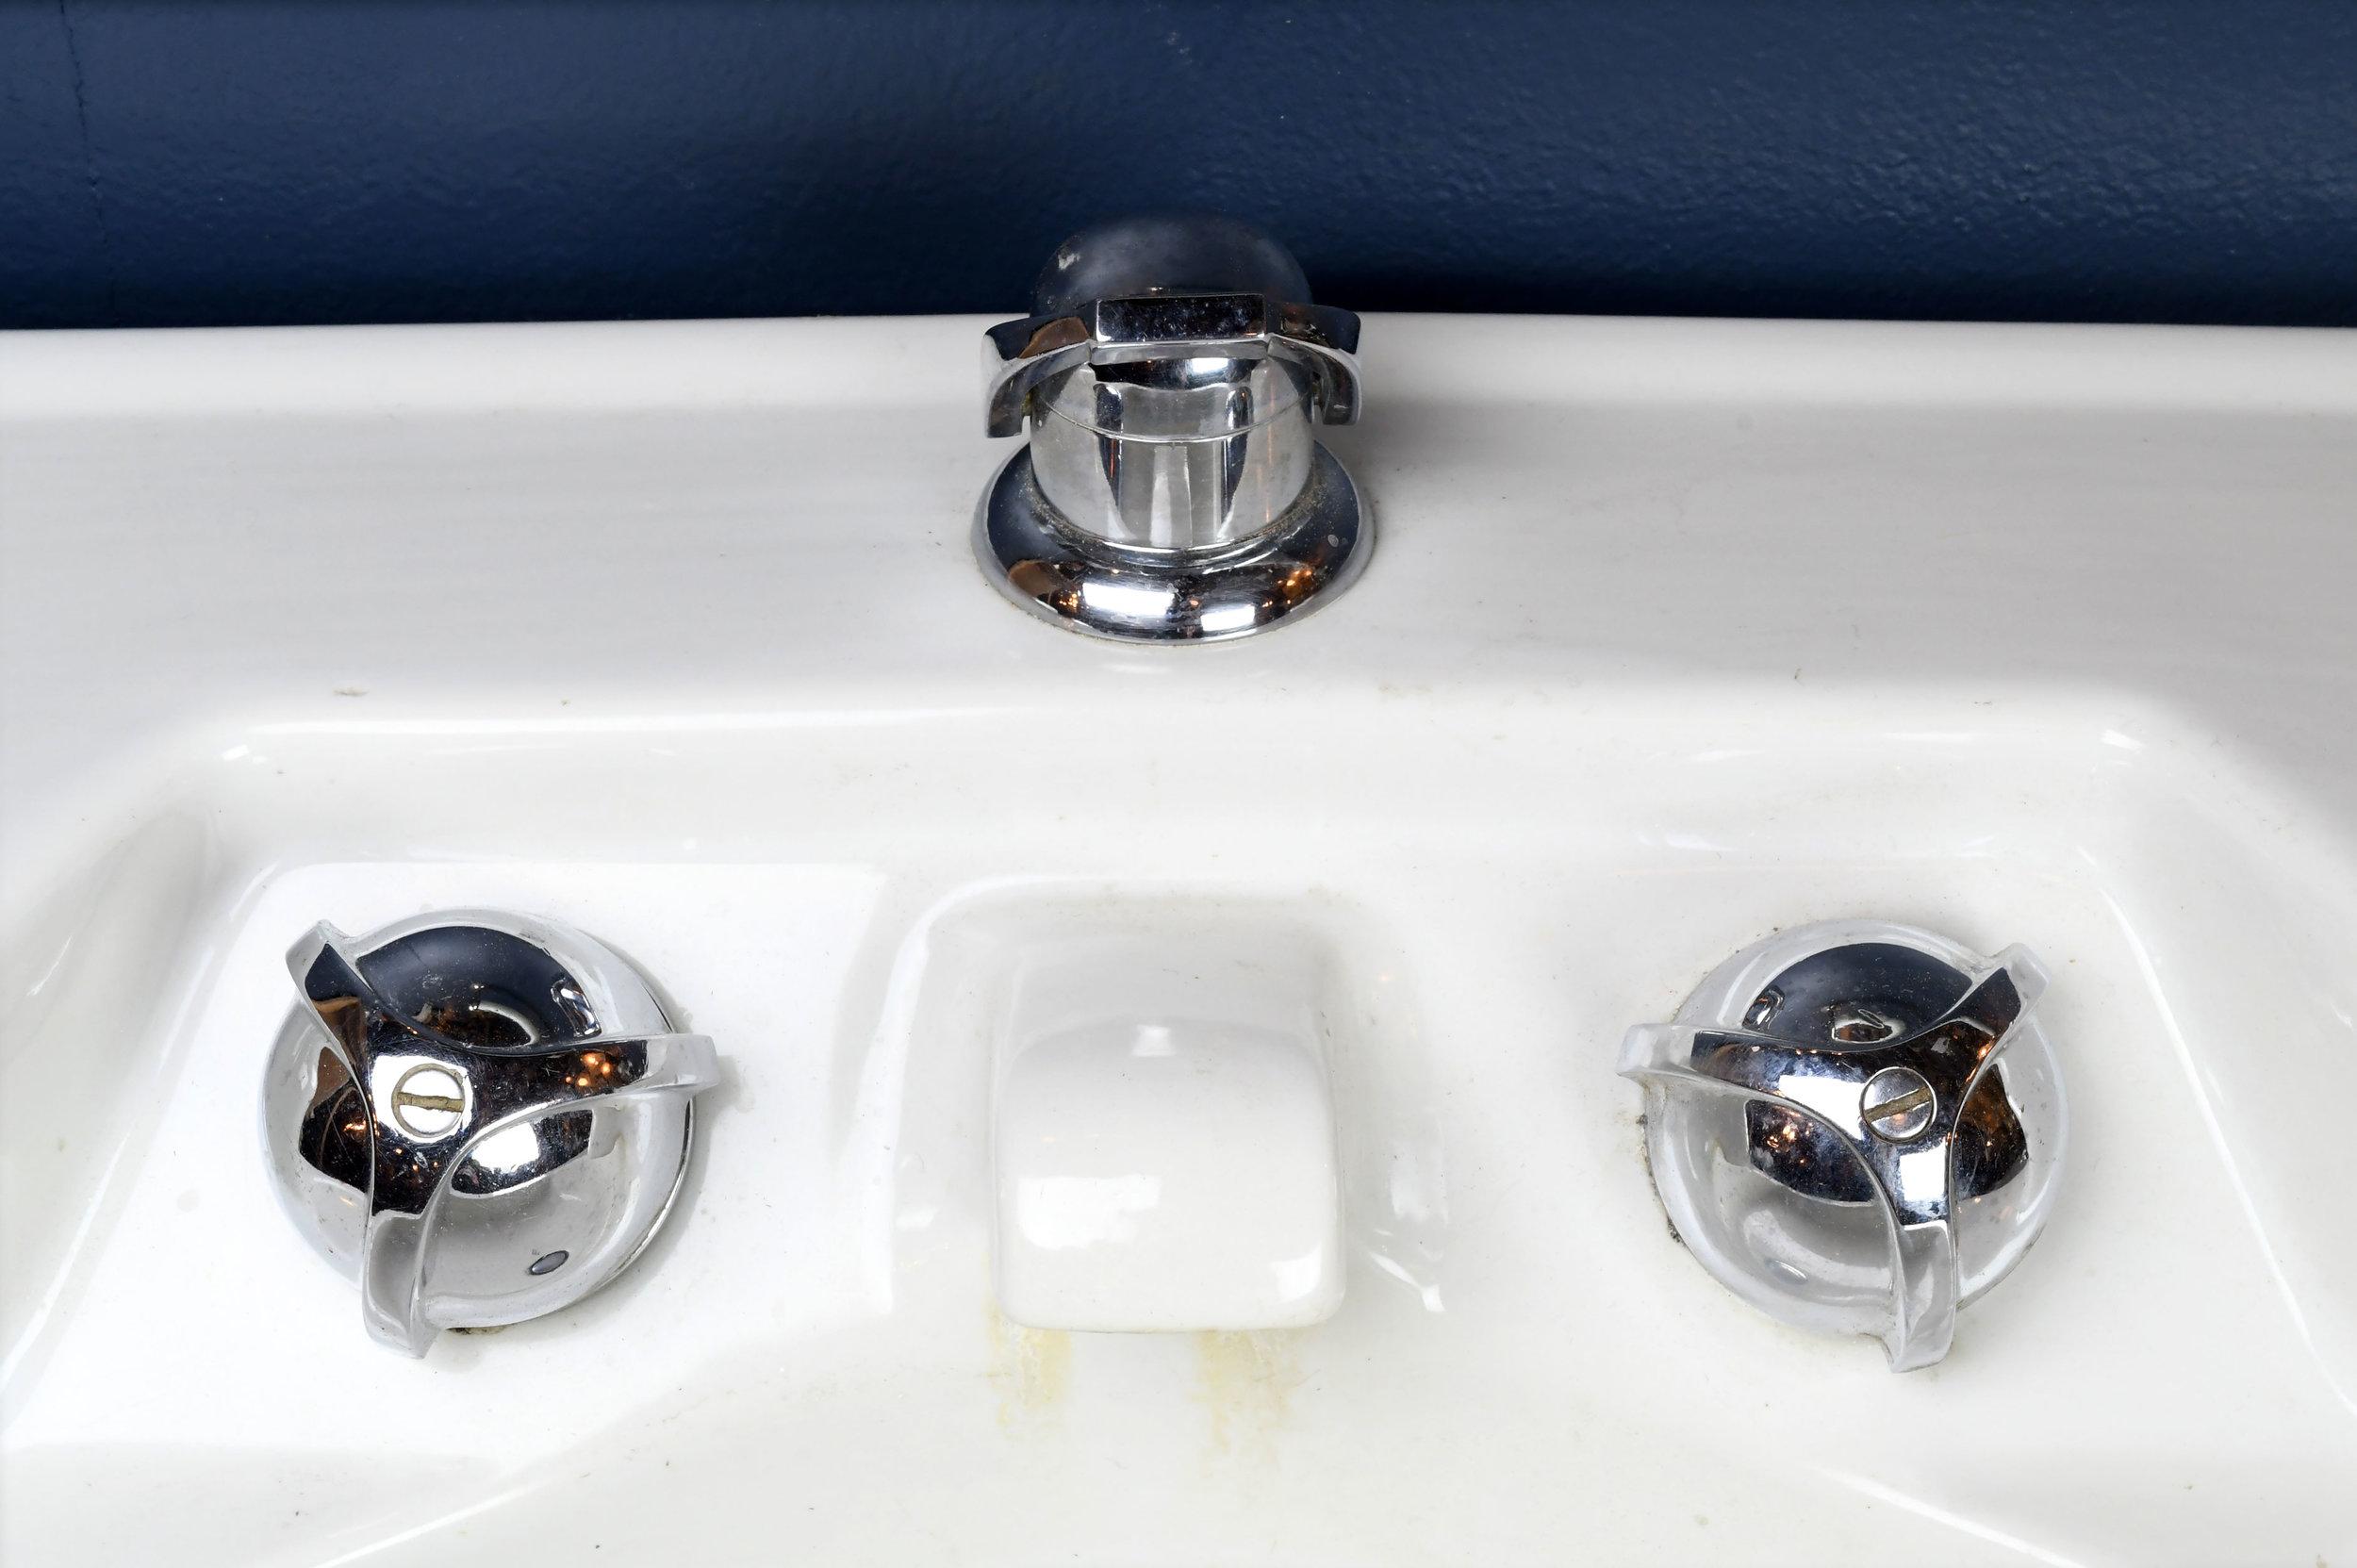 47249-1950s-wall-mount-sink-faucet-detail.jpg